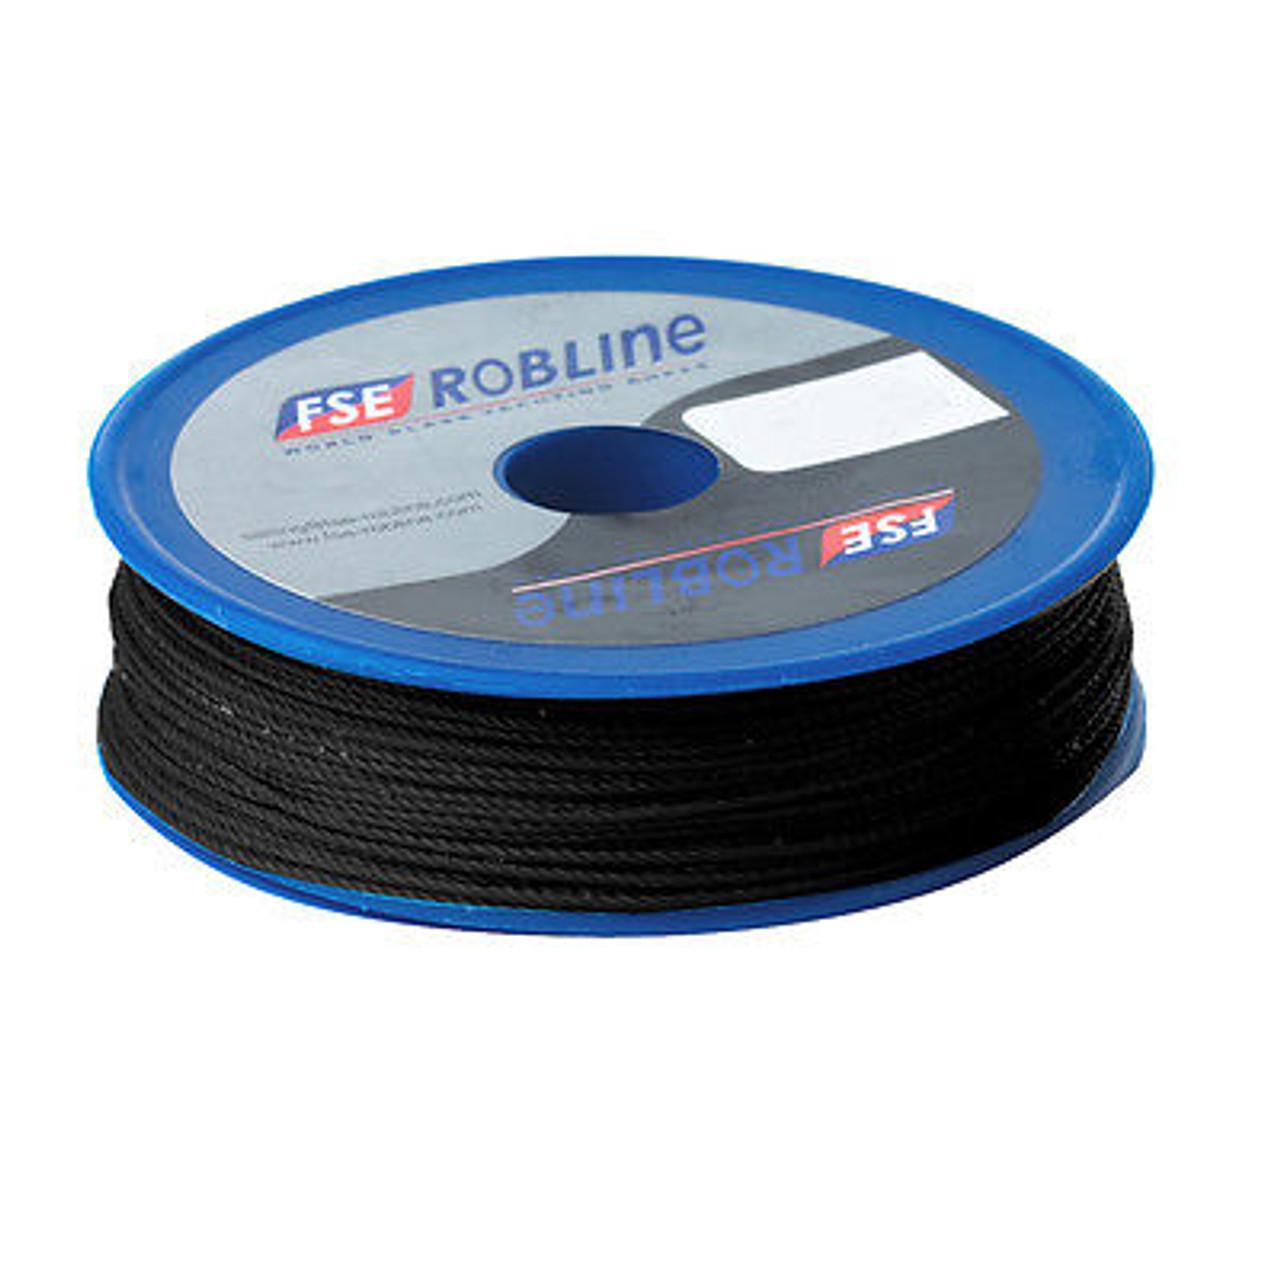 FSE Robline Waxed Tackle Yarn